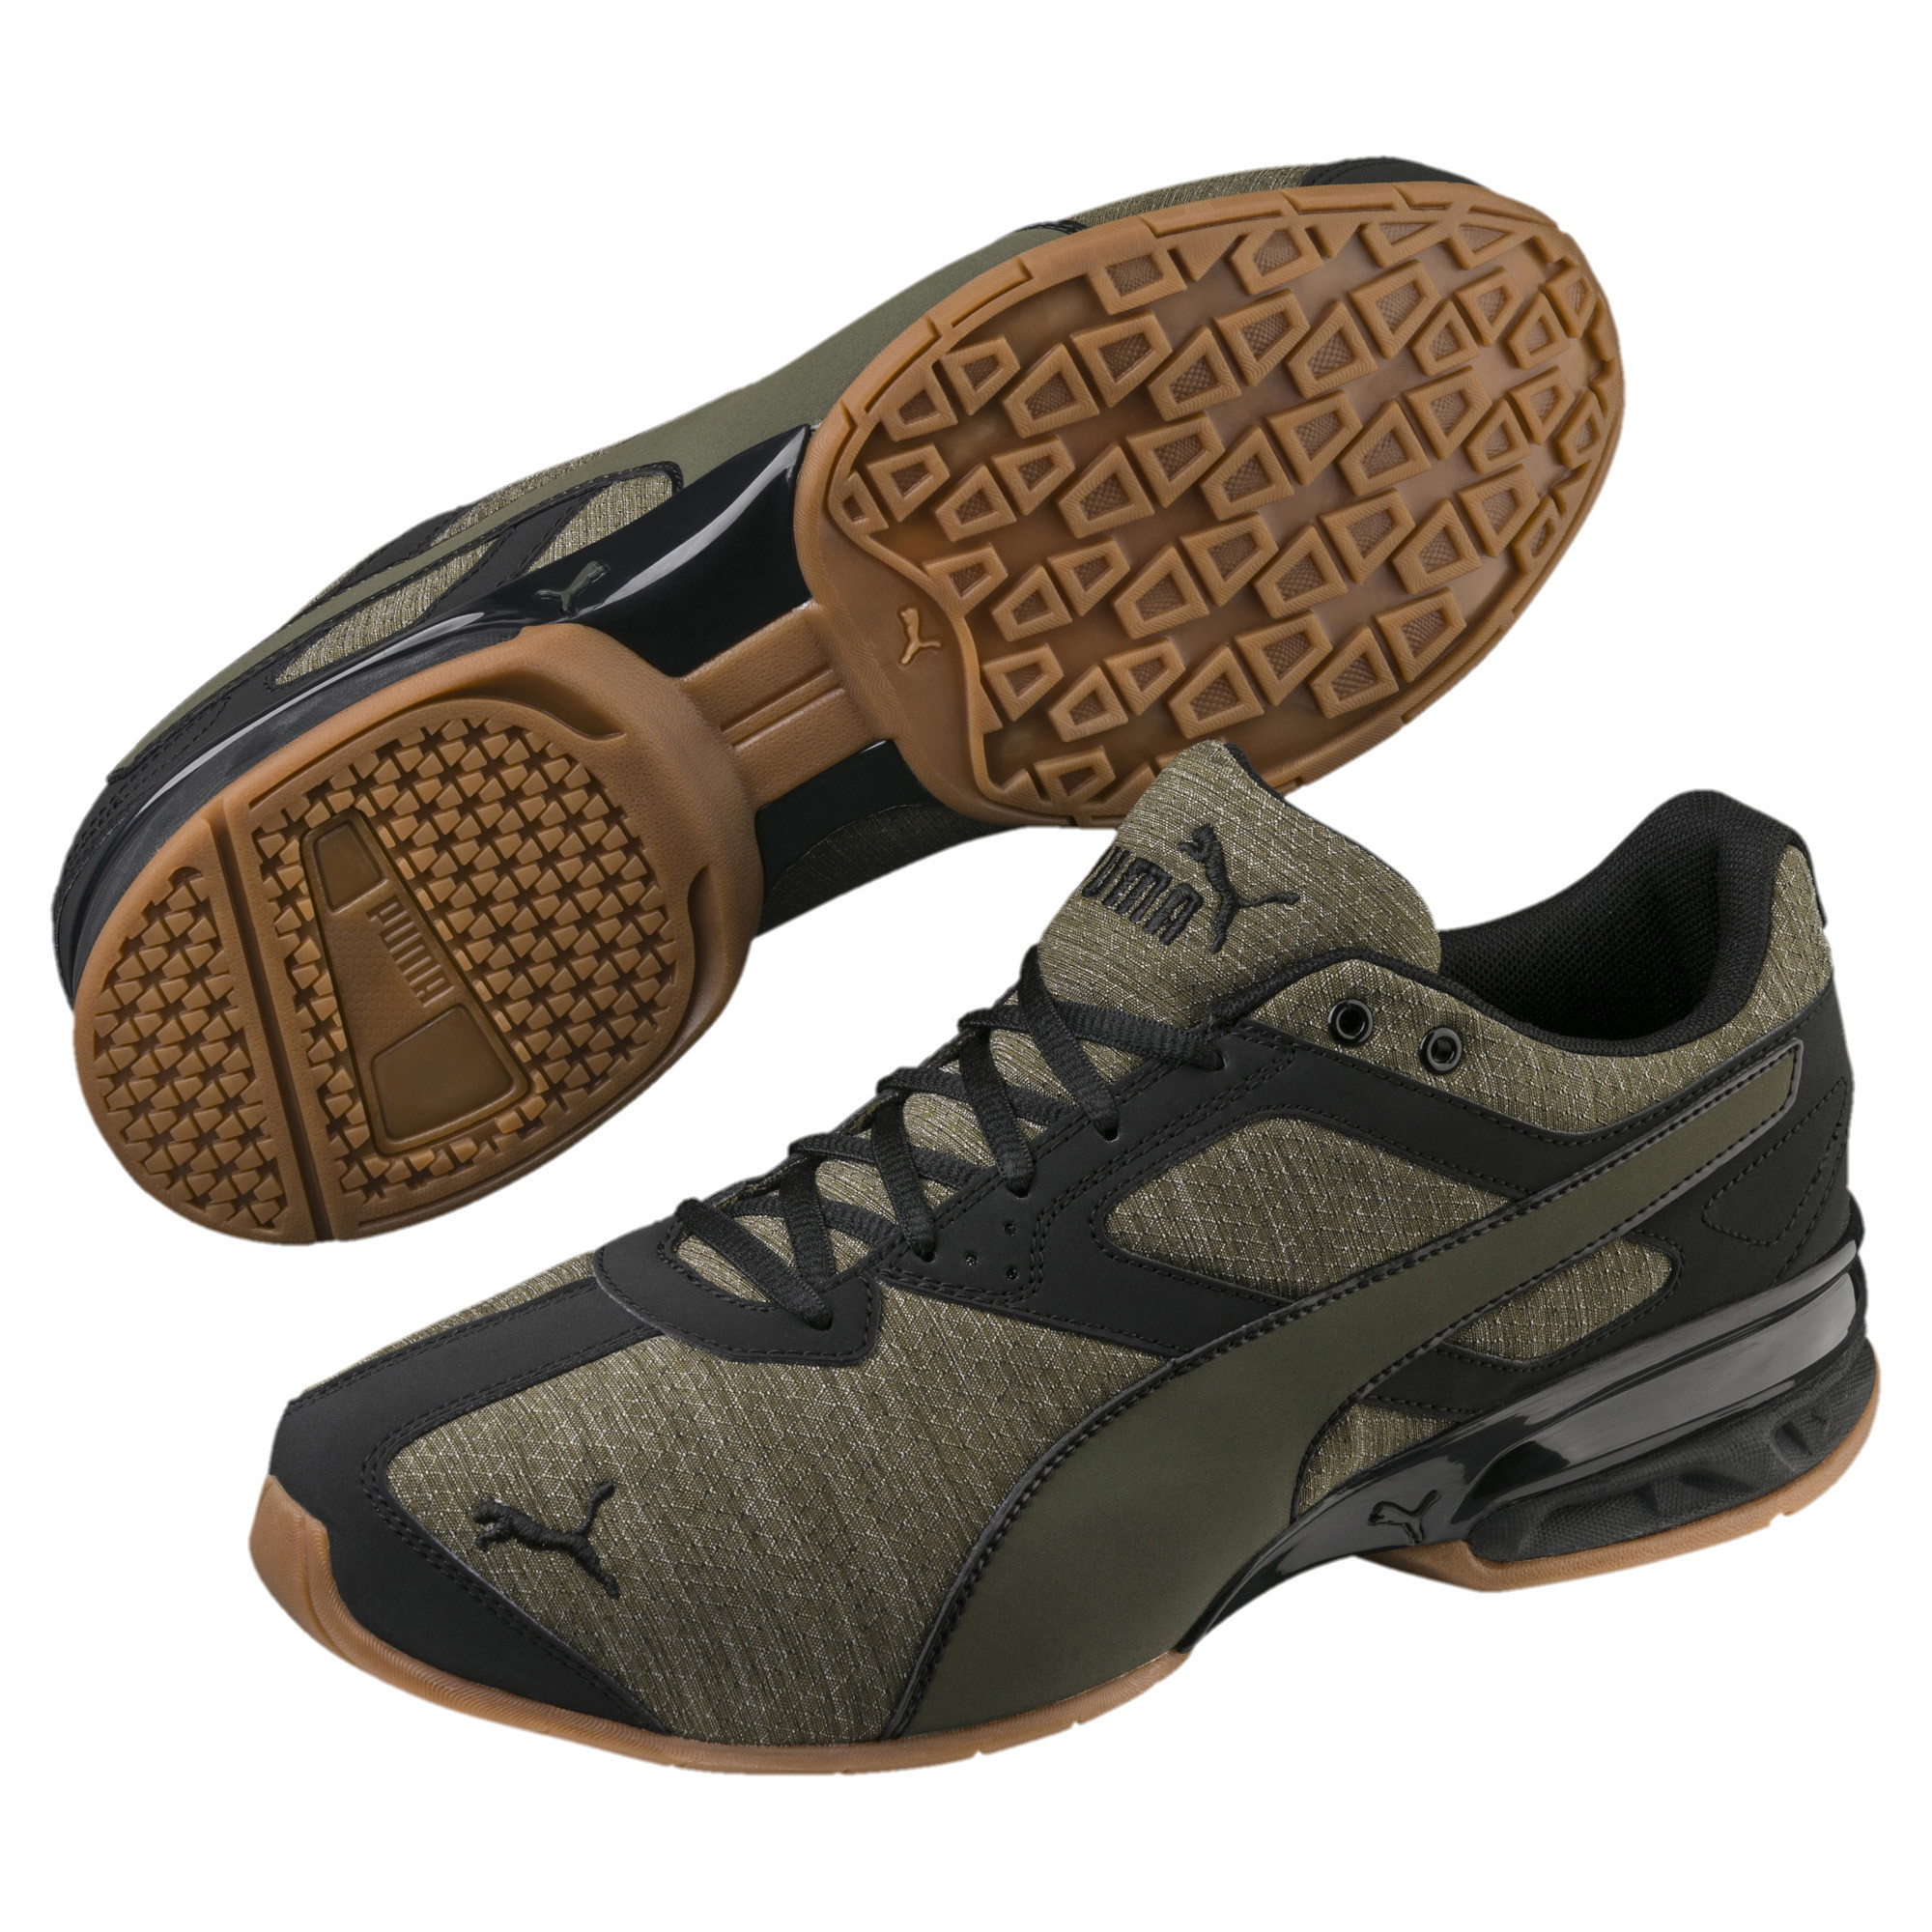 PUMA-Tazon-6-Heather-Rip-Men-s-Sneakers-Men-Shoe-Running thumbnail 7